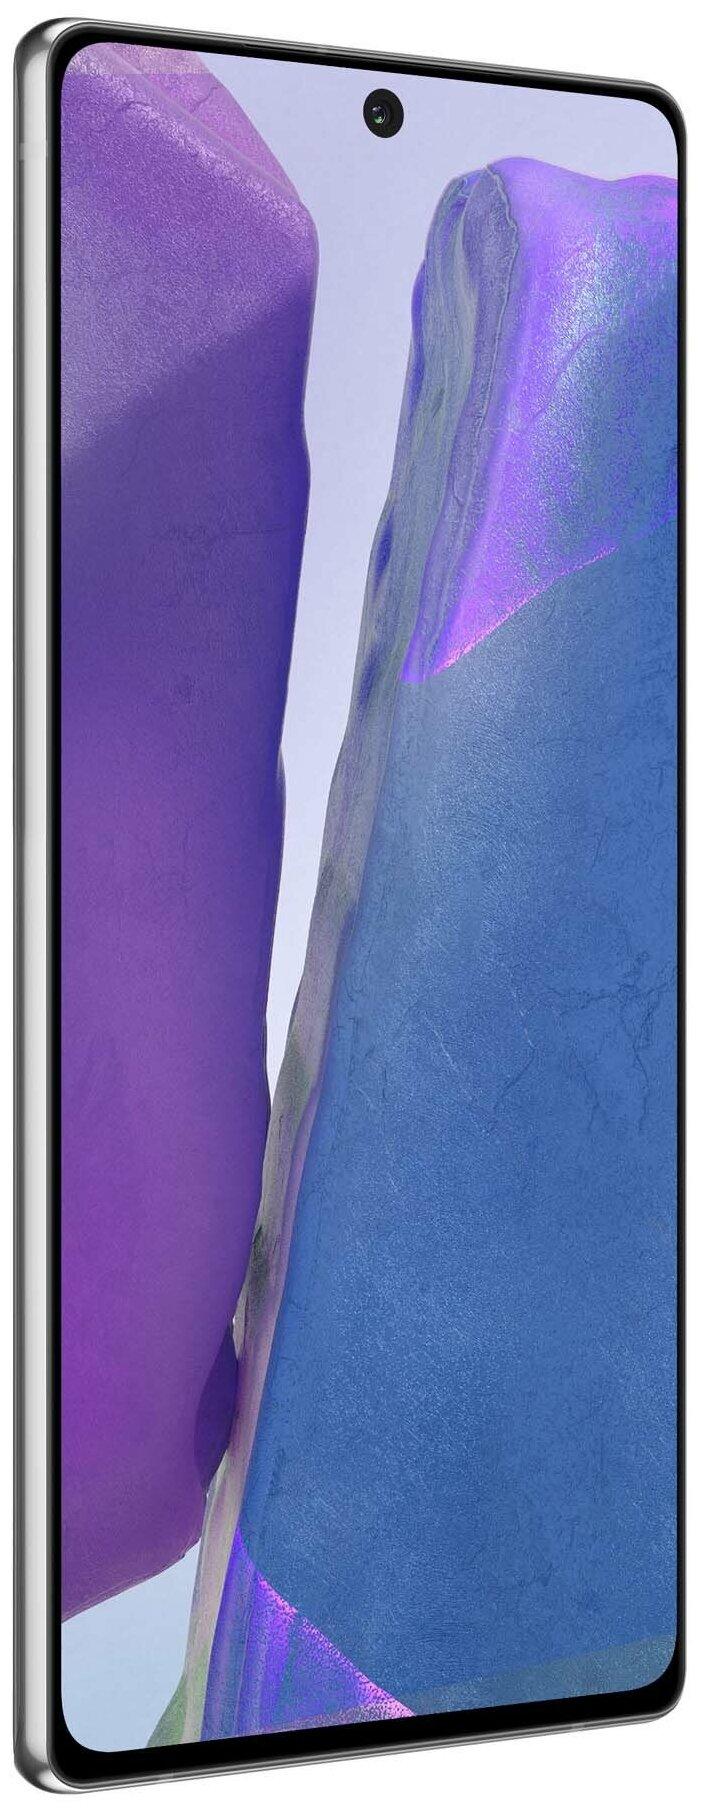 Samsung Galaxy Note 20 8/256GB - аккумулятор: 4300мА·ч